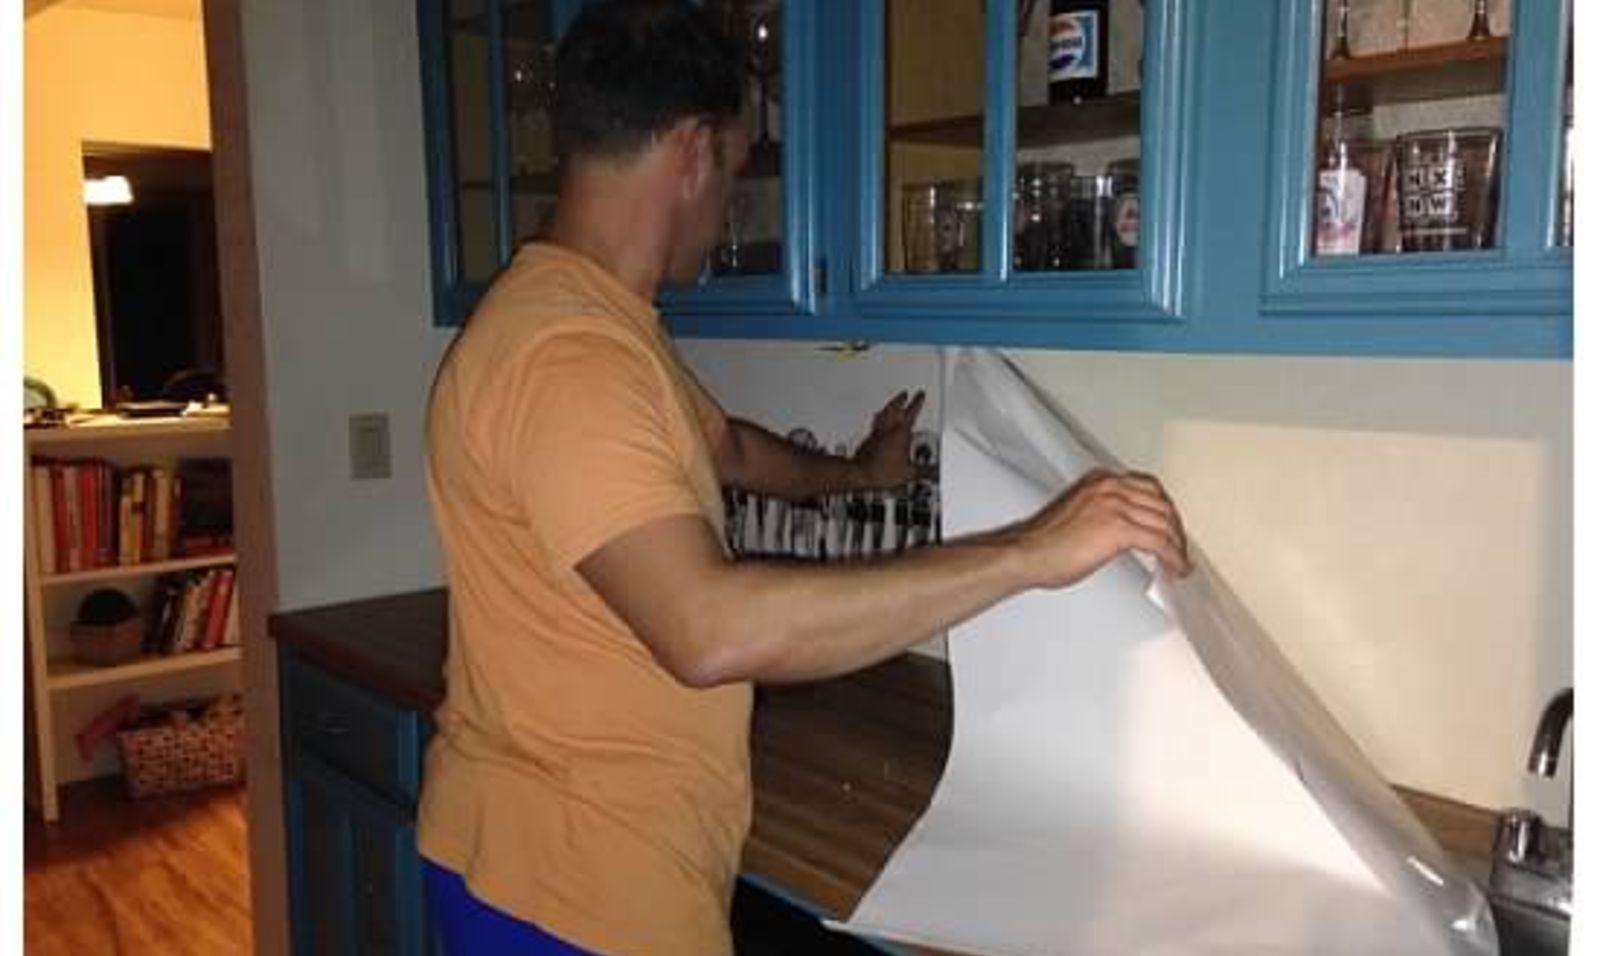 incredible metal kitchen backsplash ideas   13 Incredible Kitchen Backsplash Ideas That Aren't Tile ...